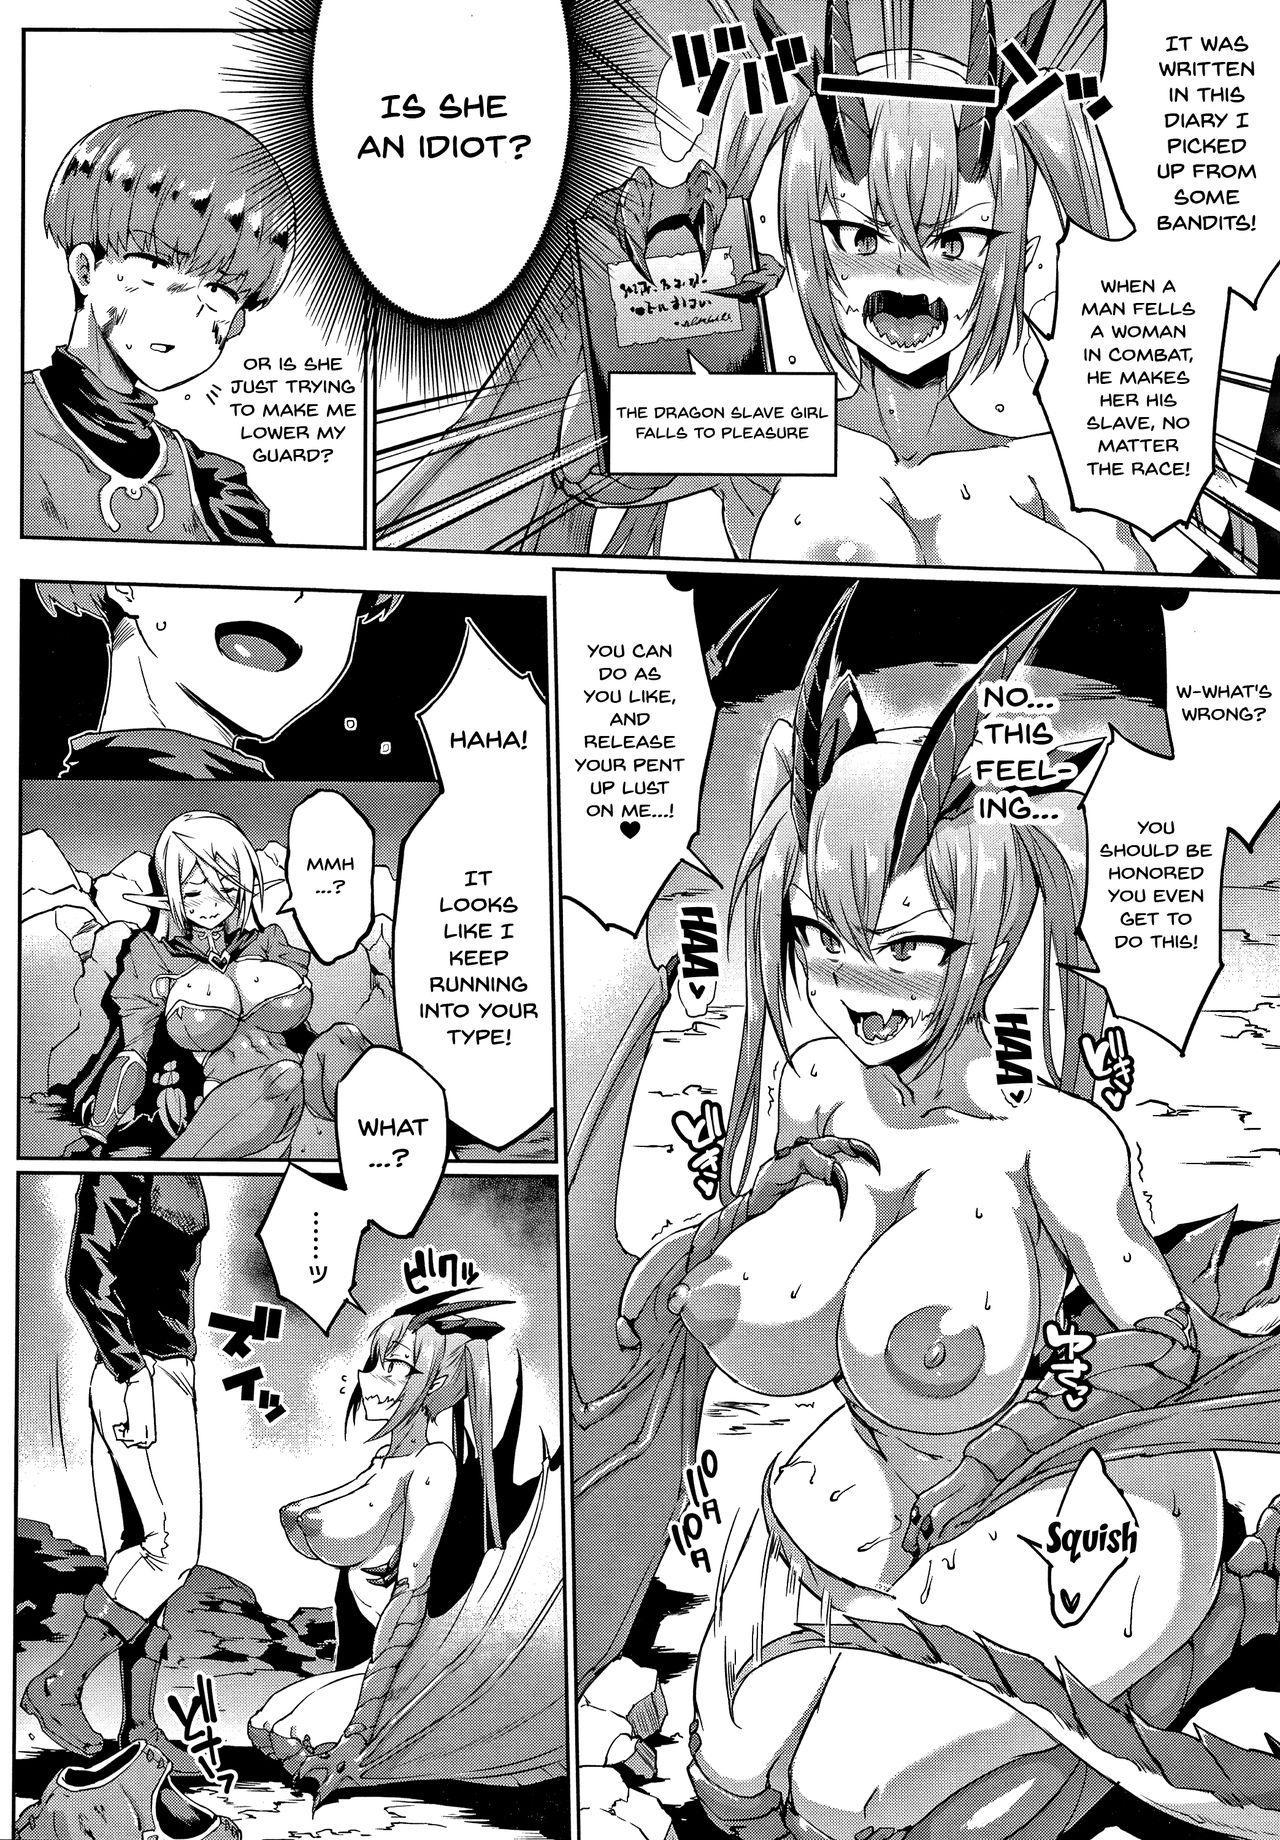 [Fan no Hitori] Sennen Reijou ~My Lady, My Master~  Ch.1-6 [English] {Doujins.com} 60